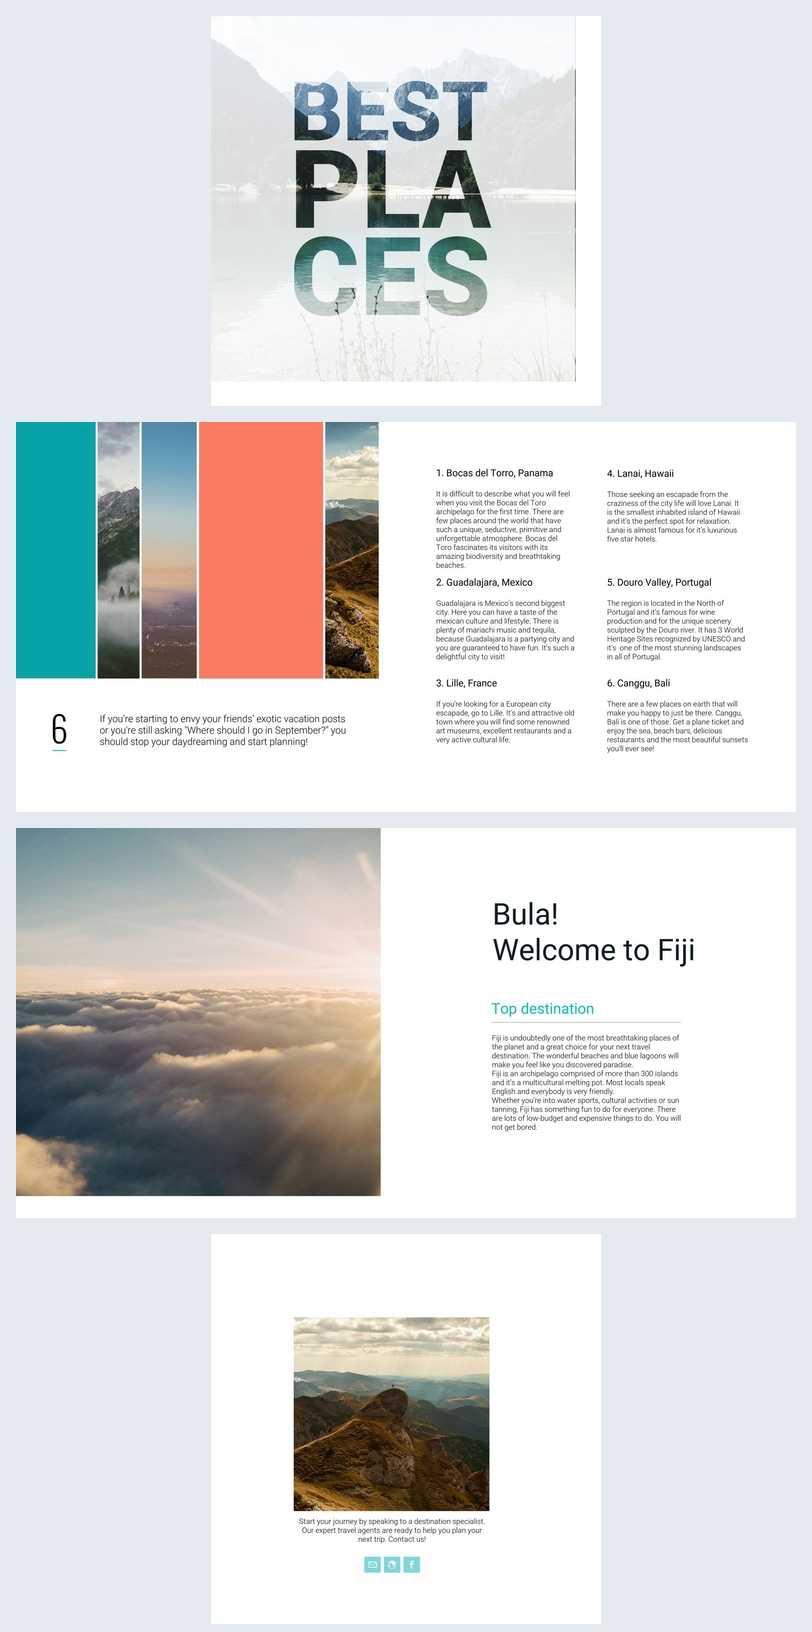 Beautiful Travel Guide Brochure Template - Flipsnack With Regard To Travel Guide Brochure Template